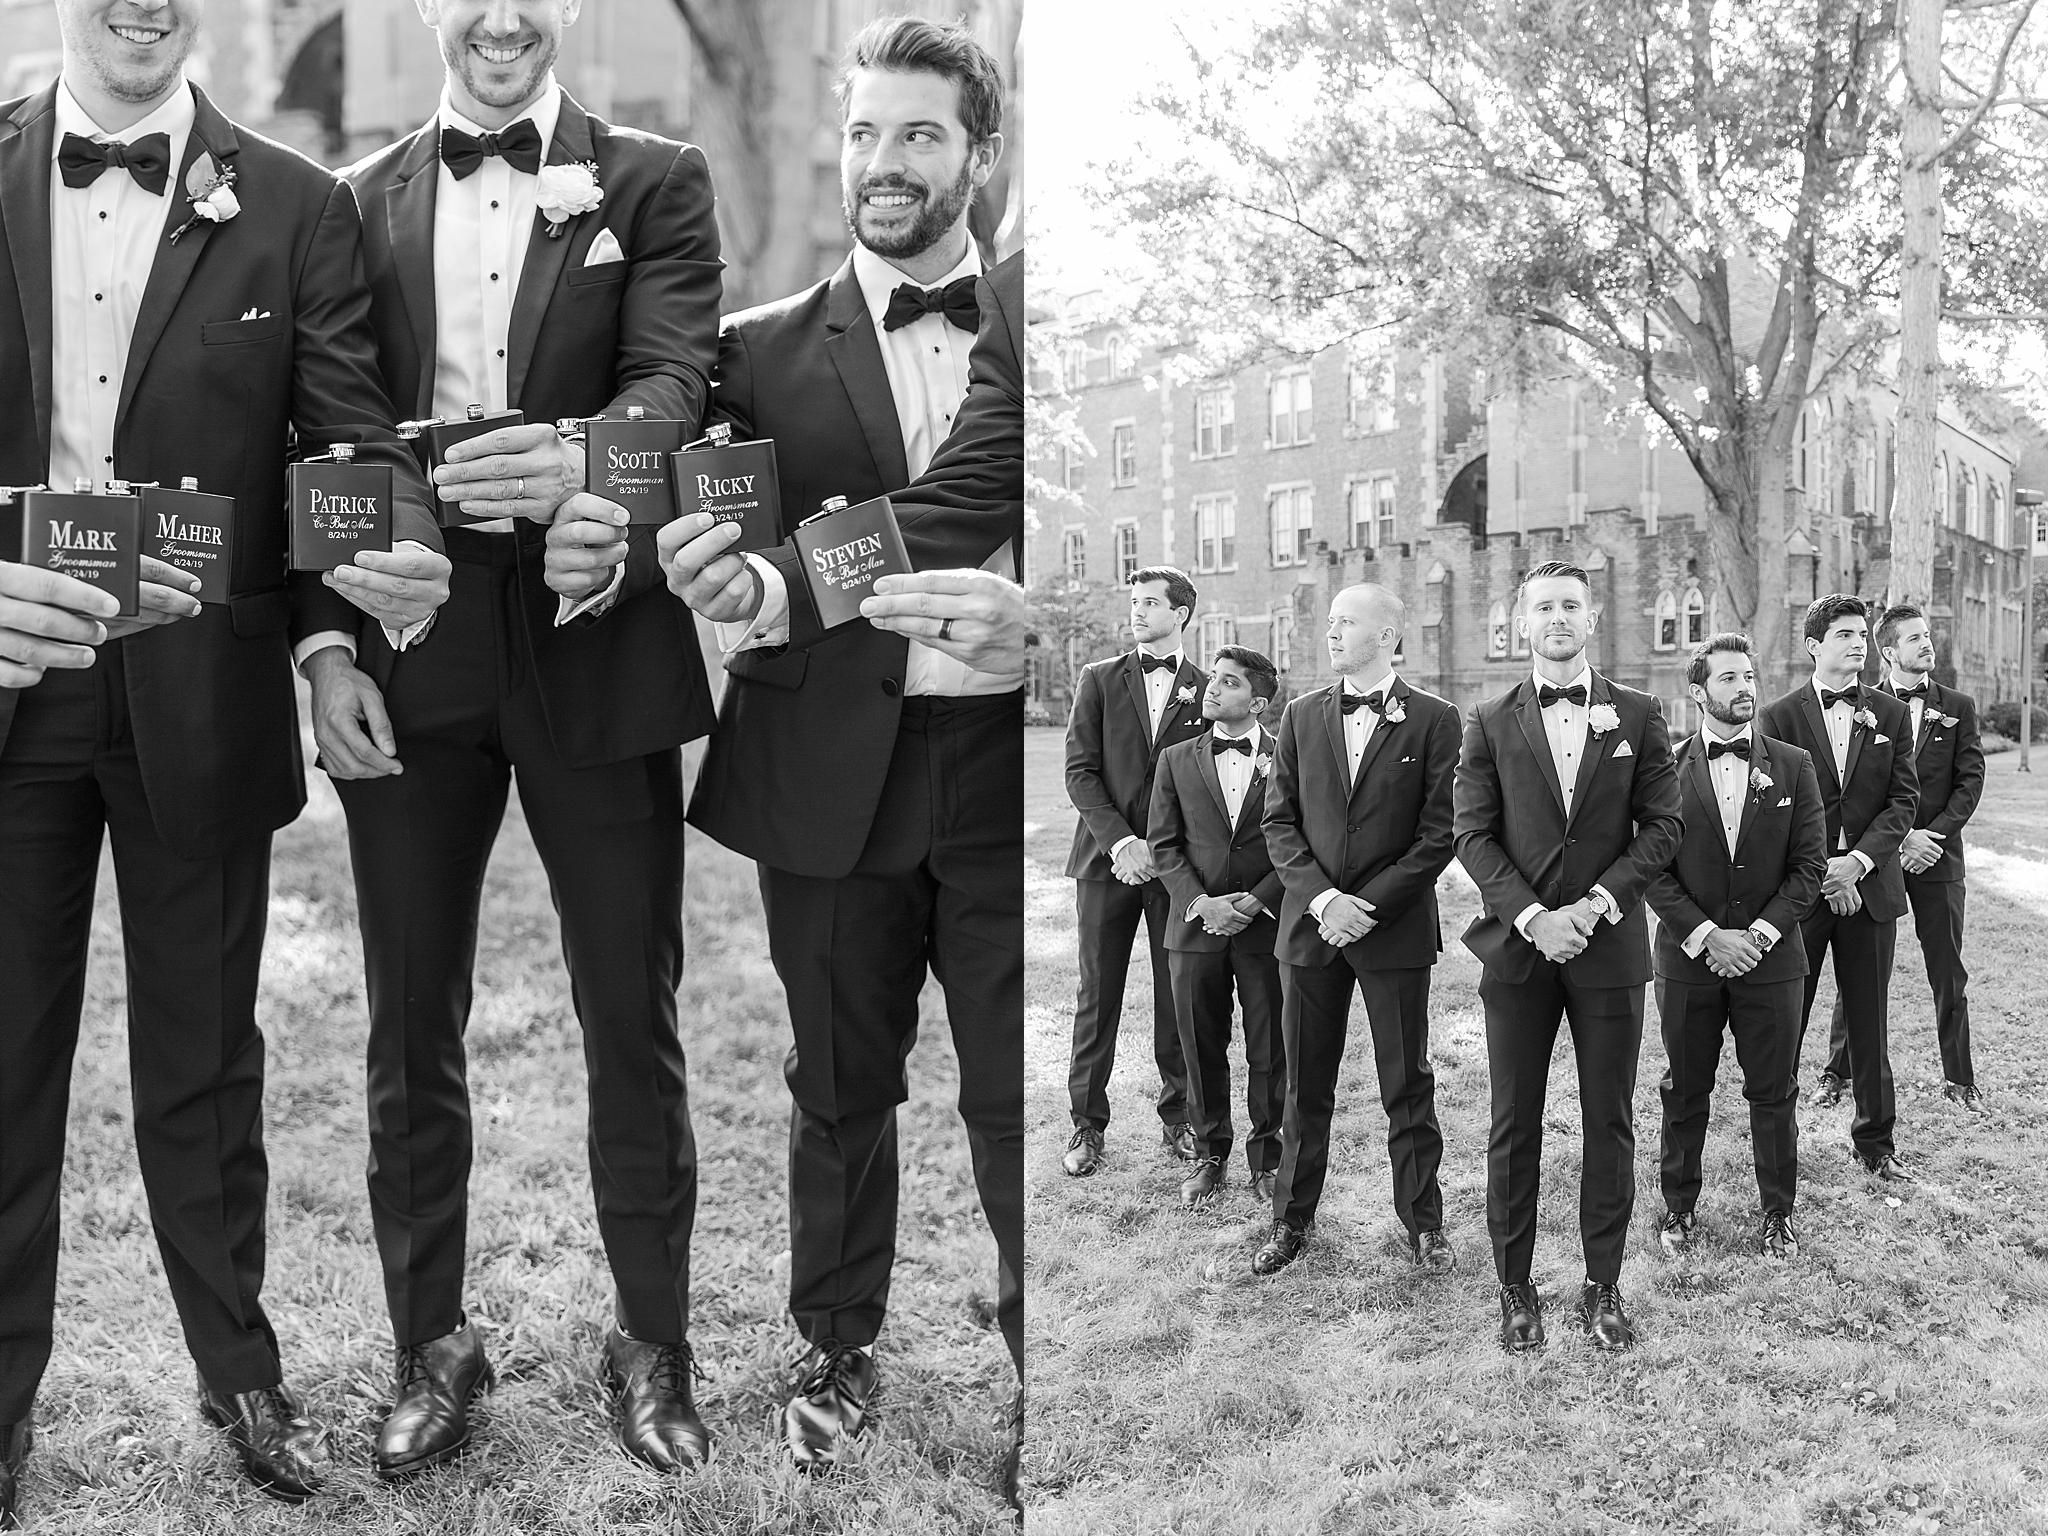 detroit-wedding-photographer-grosse-pointe-academy-chapel-detroit-golf-club-wedding-carly-matt-by-courtney-carolyn-photography_0068.jpg